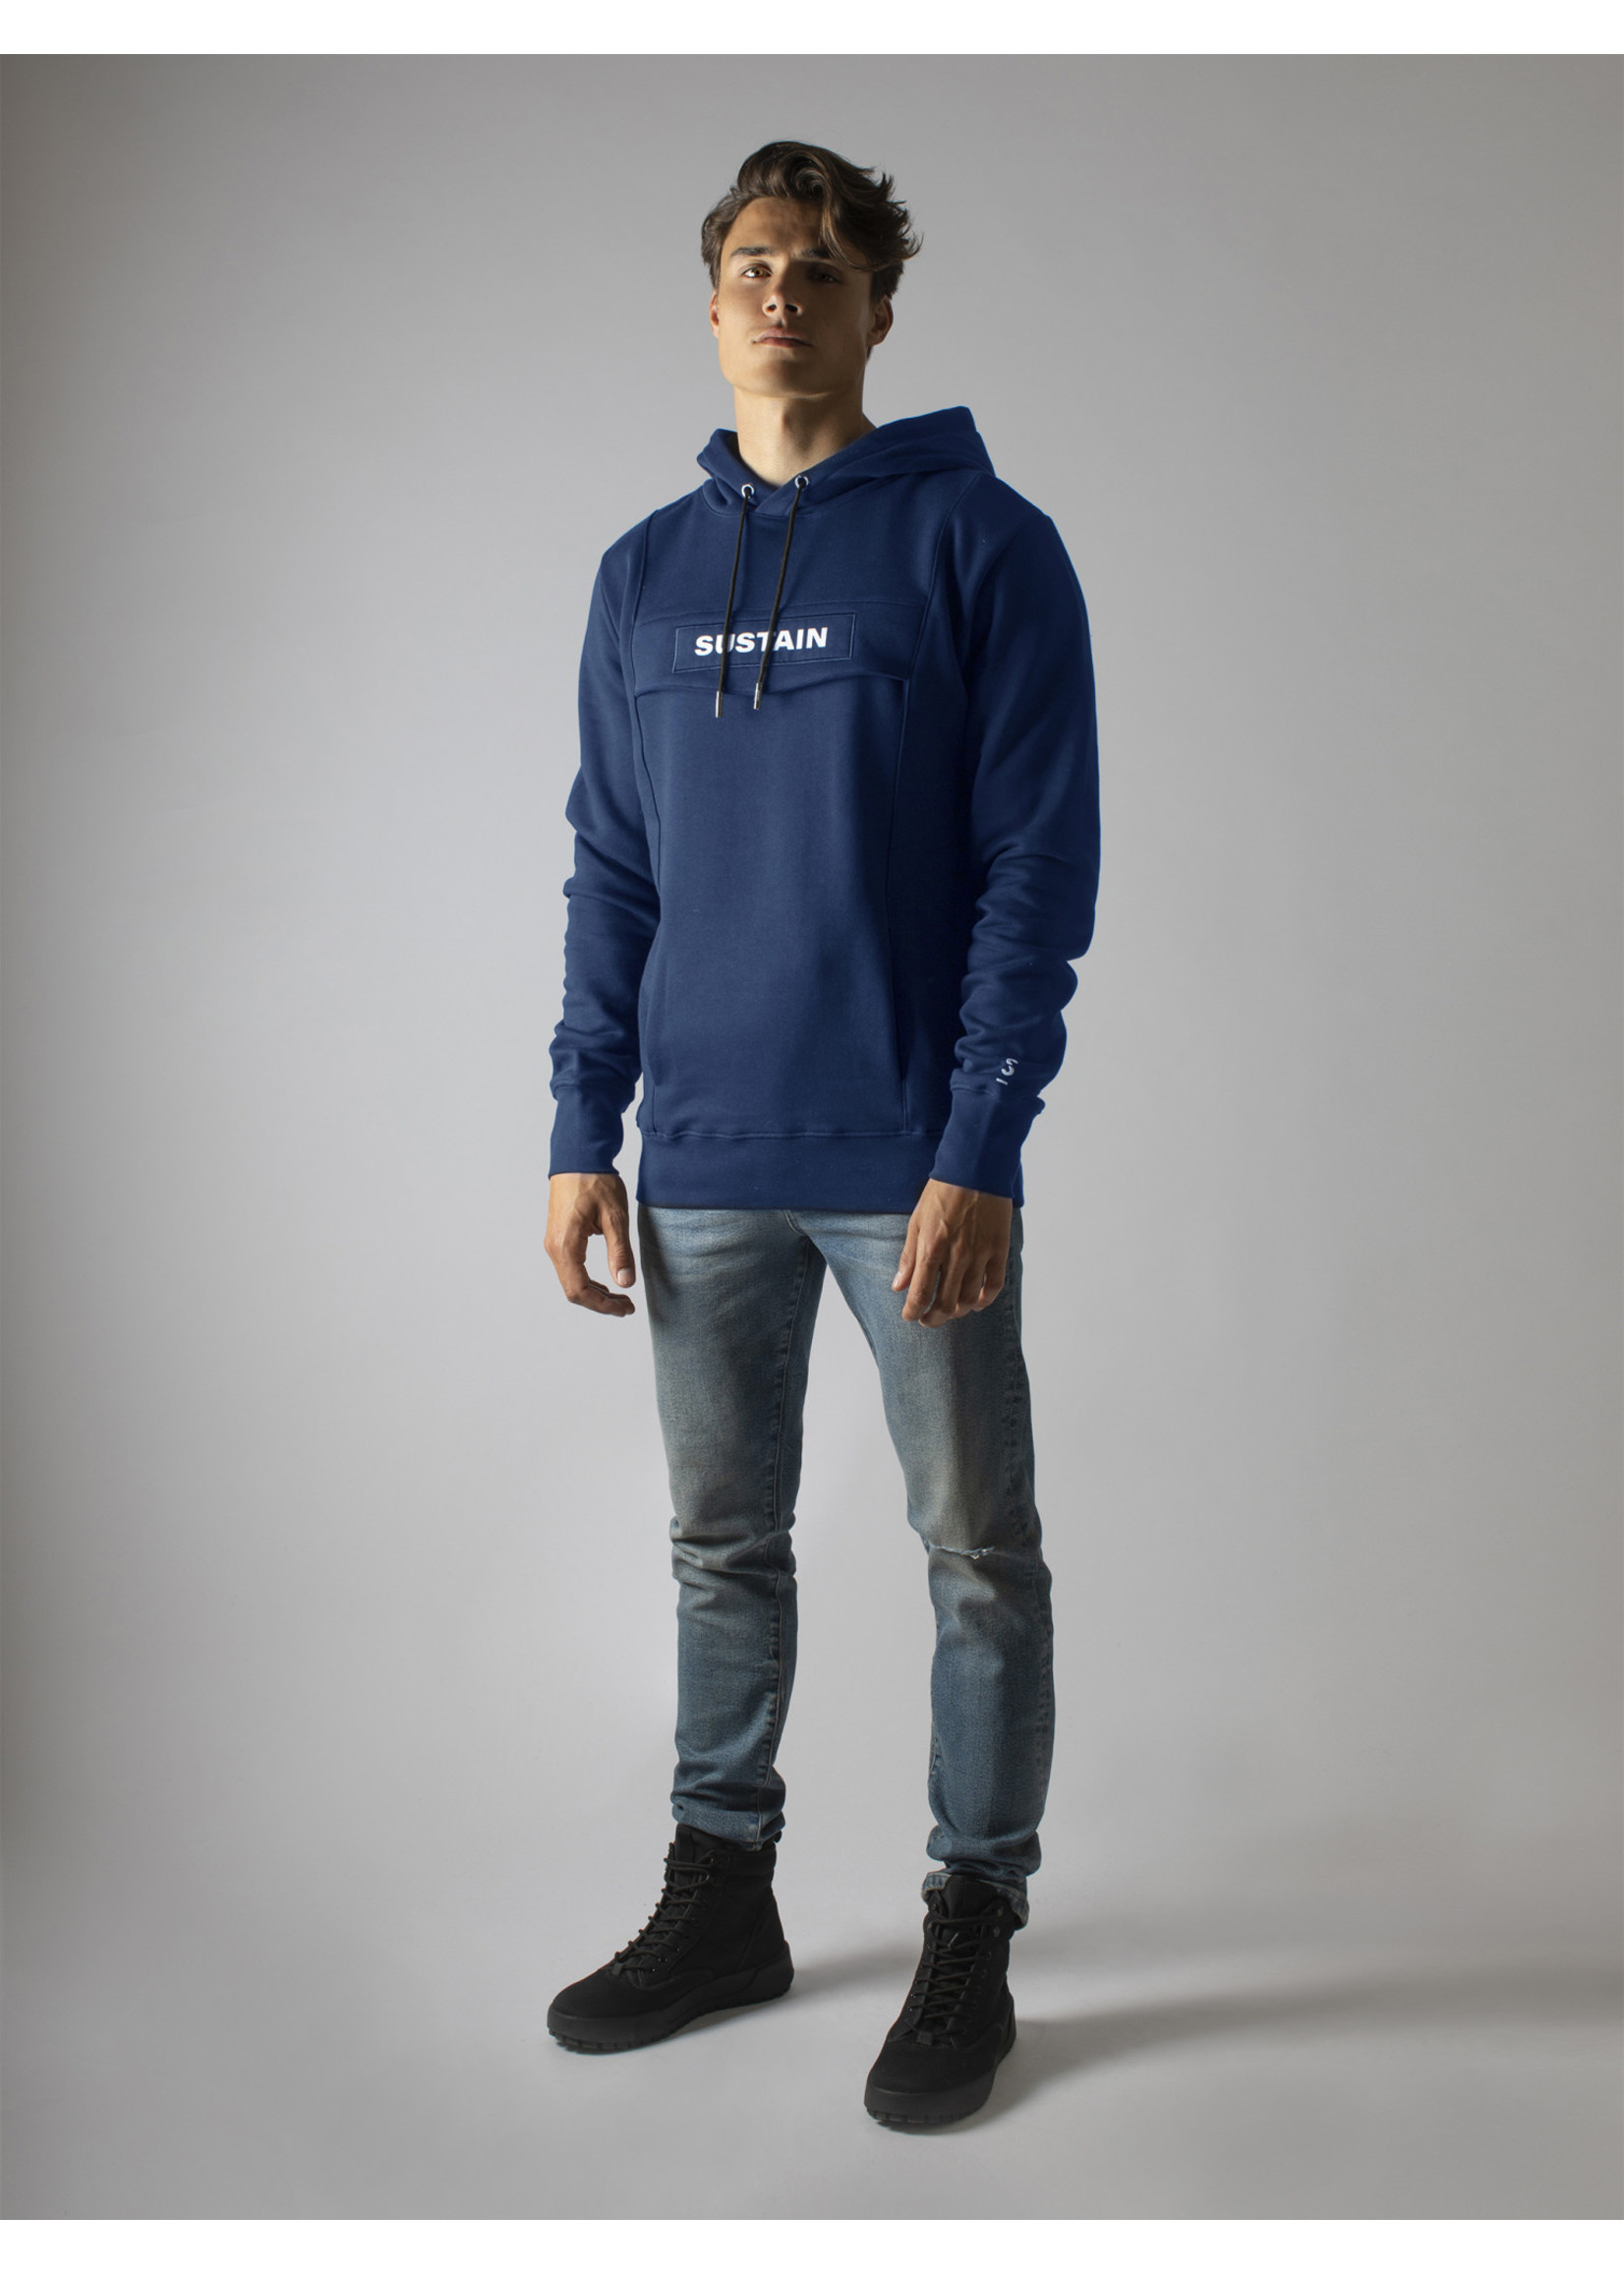 Sustain Sustain Logo Anorak Regular - Blue